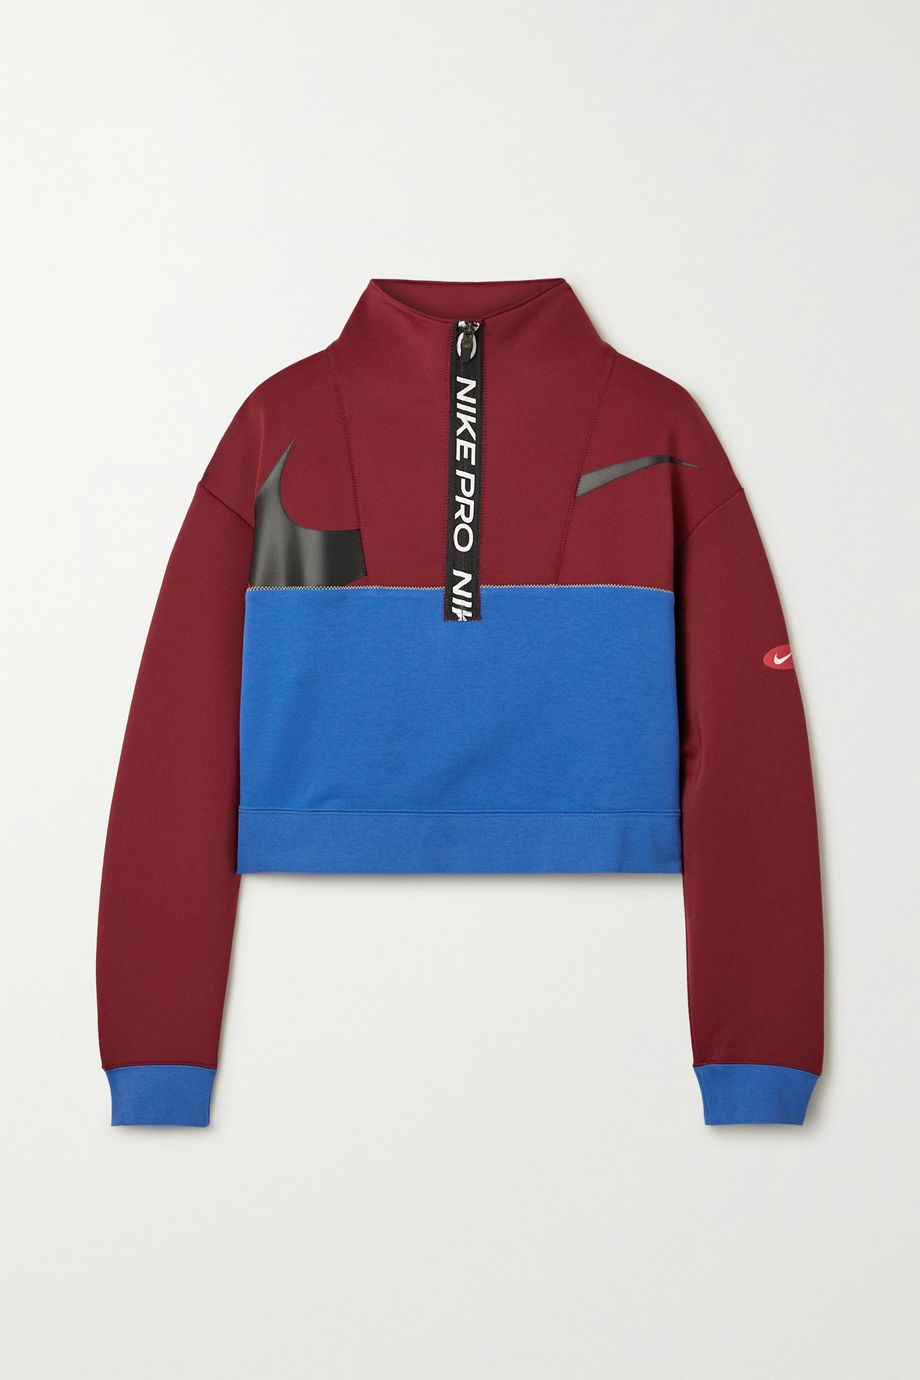 Nike Icon Clash cropped color-block Dri-FIT fleece sweatshirt